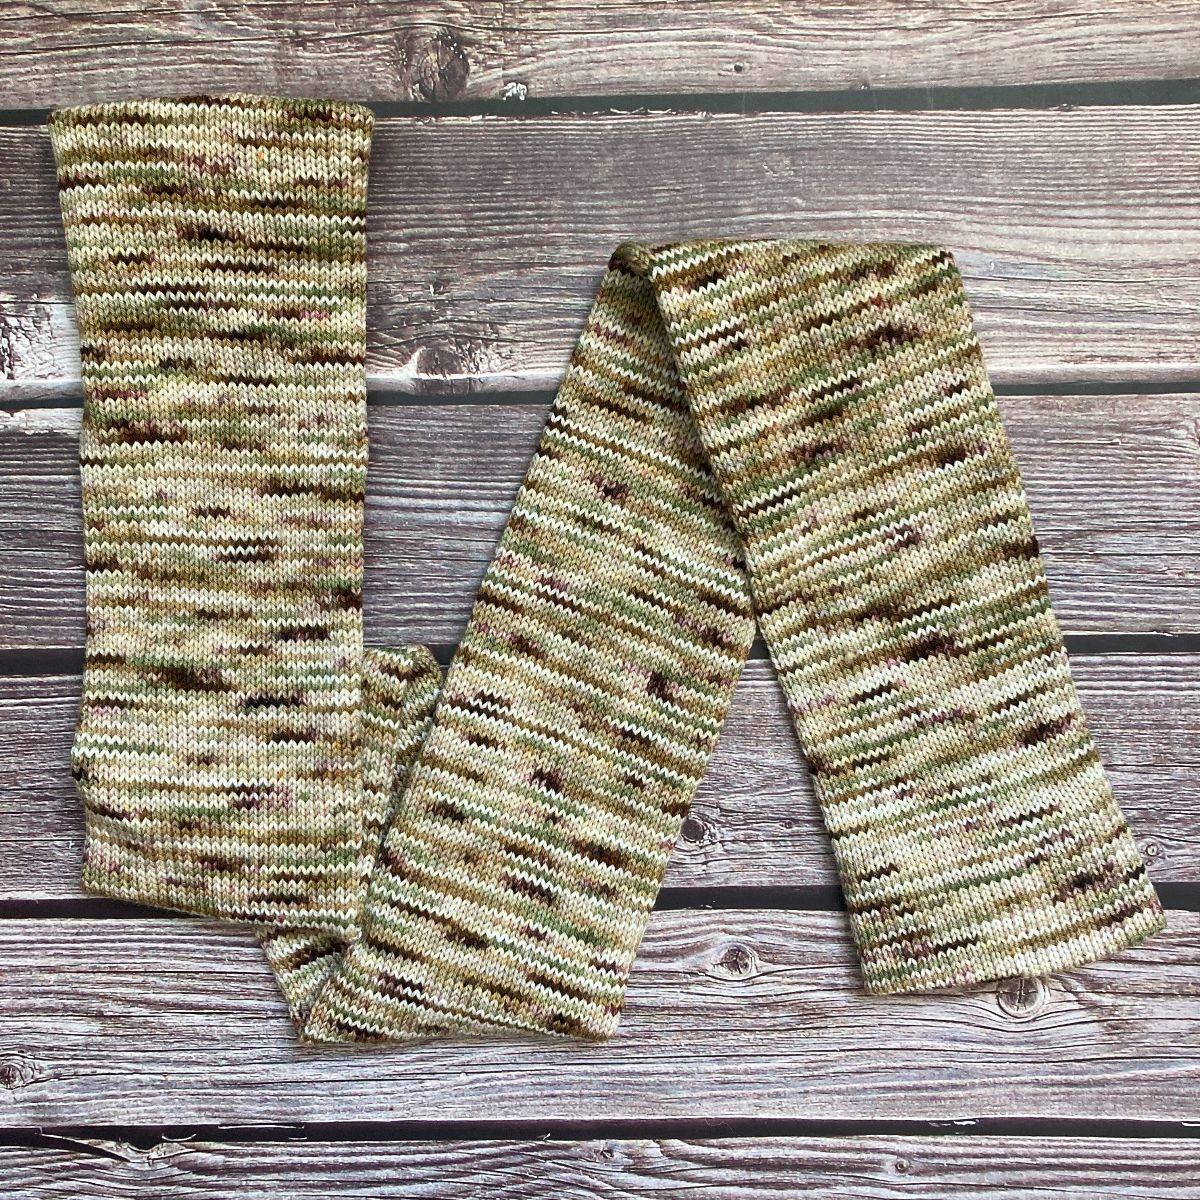 Knitted Wit HerStory Sock Club - DK - 2021 - Veteran Affairs (Senator Tammy Duckworth)